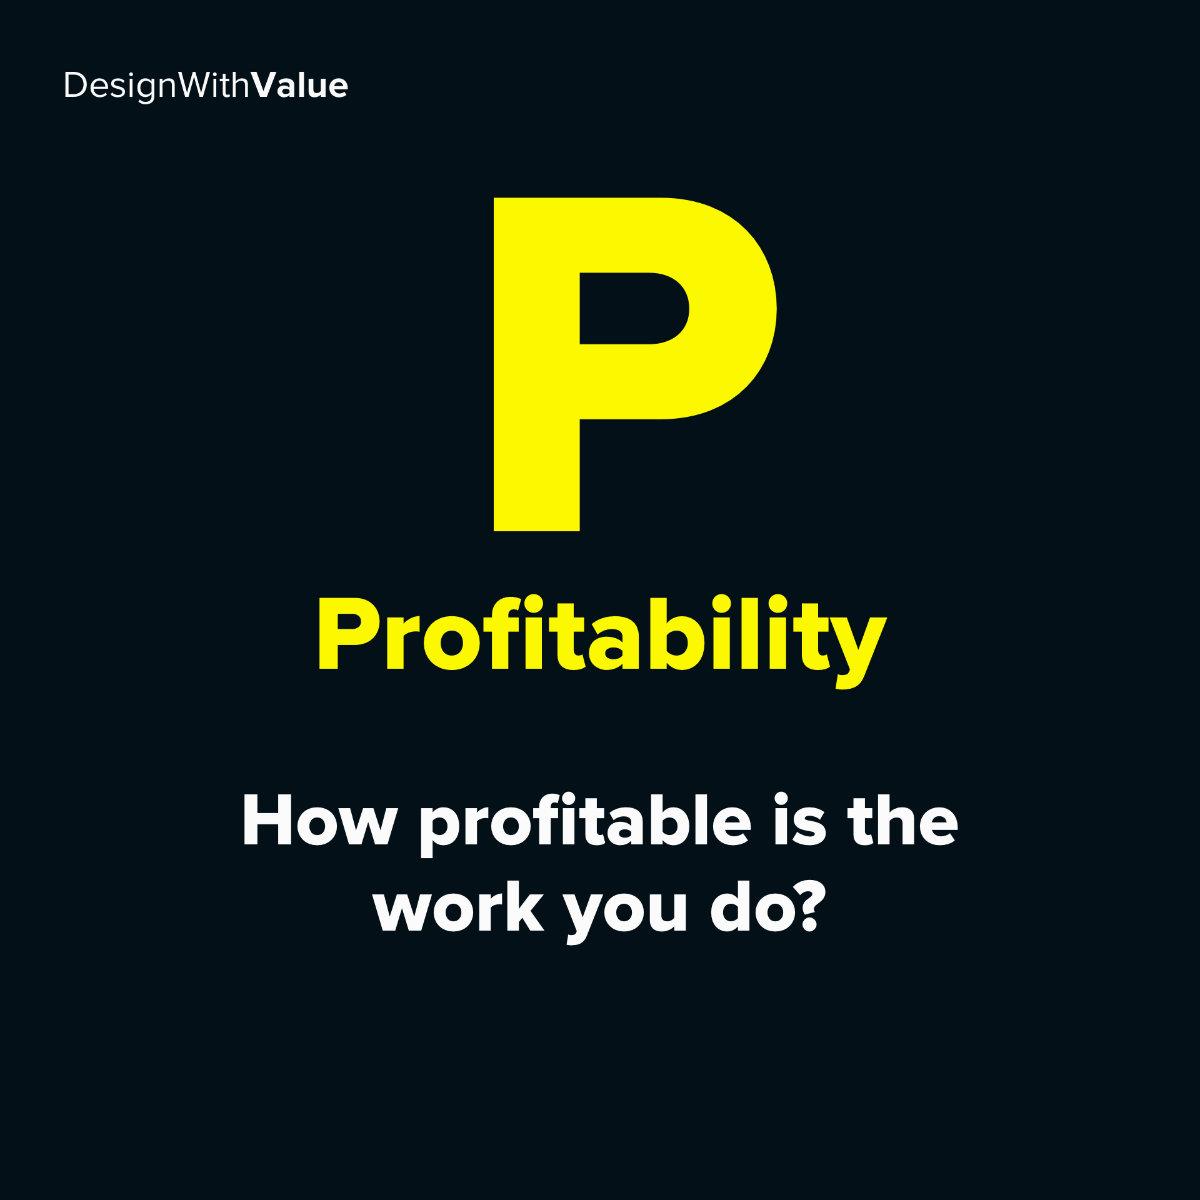 P = Profitability